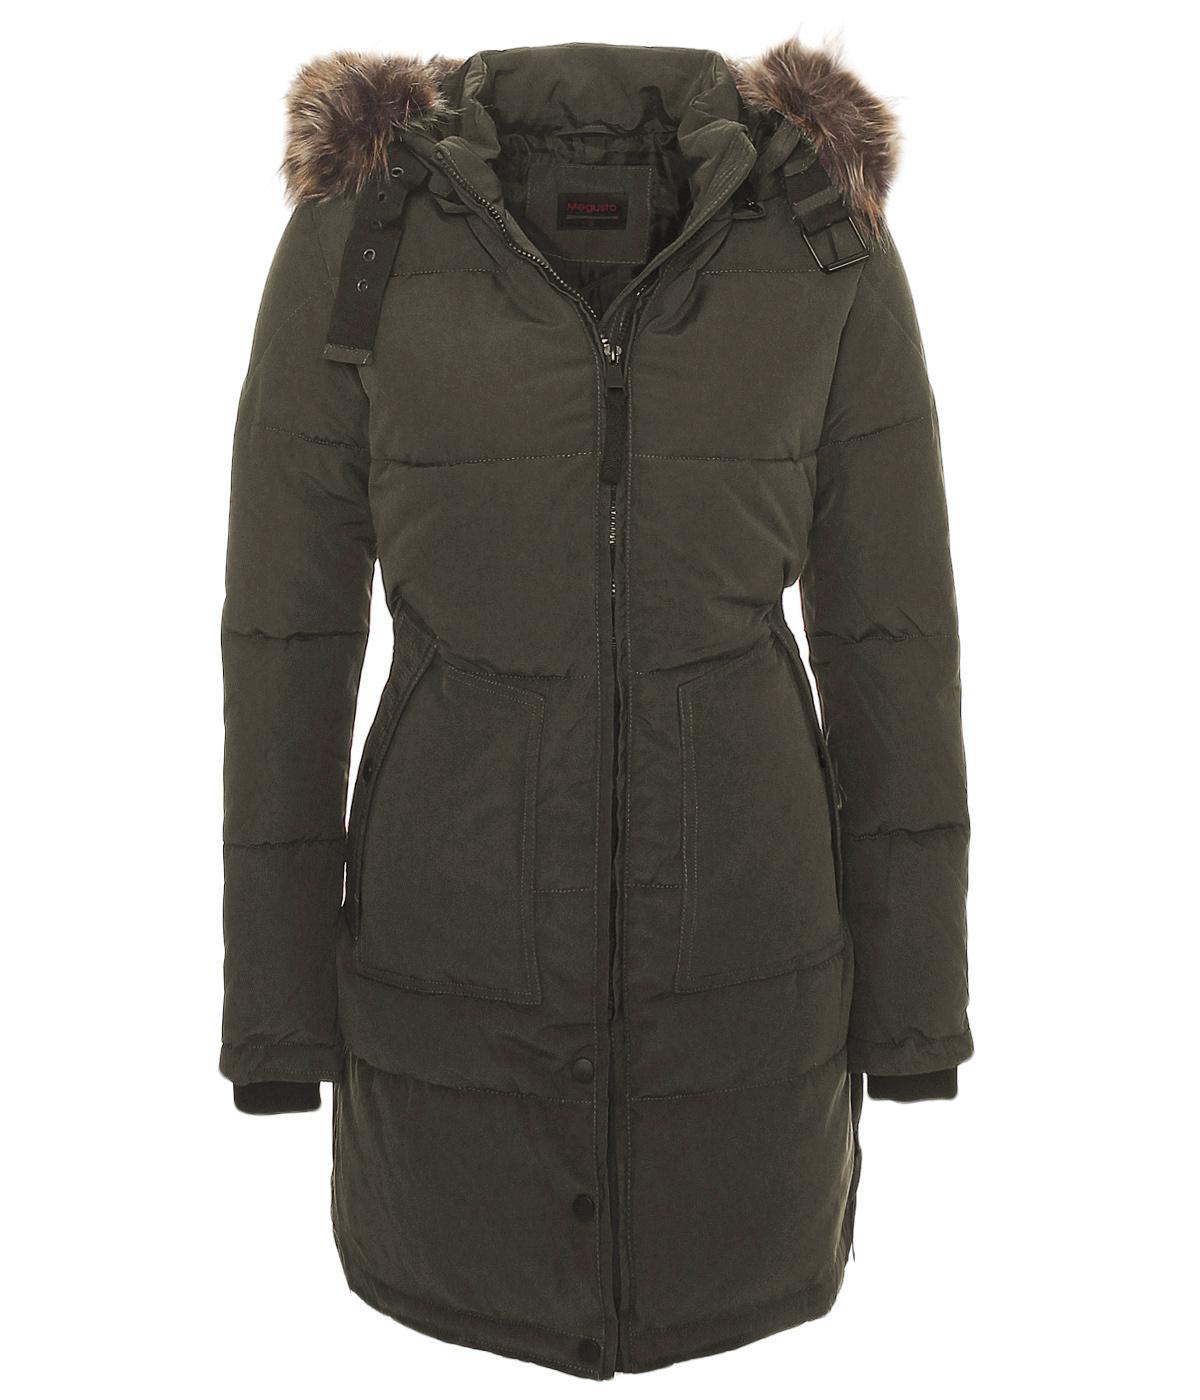 damen warmer wintermantel winter stepp mantel jacke lang parka kunstpelz dv 065 ebay. Black Bedroom Furniture Sets. Home Design Ideas